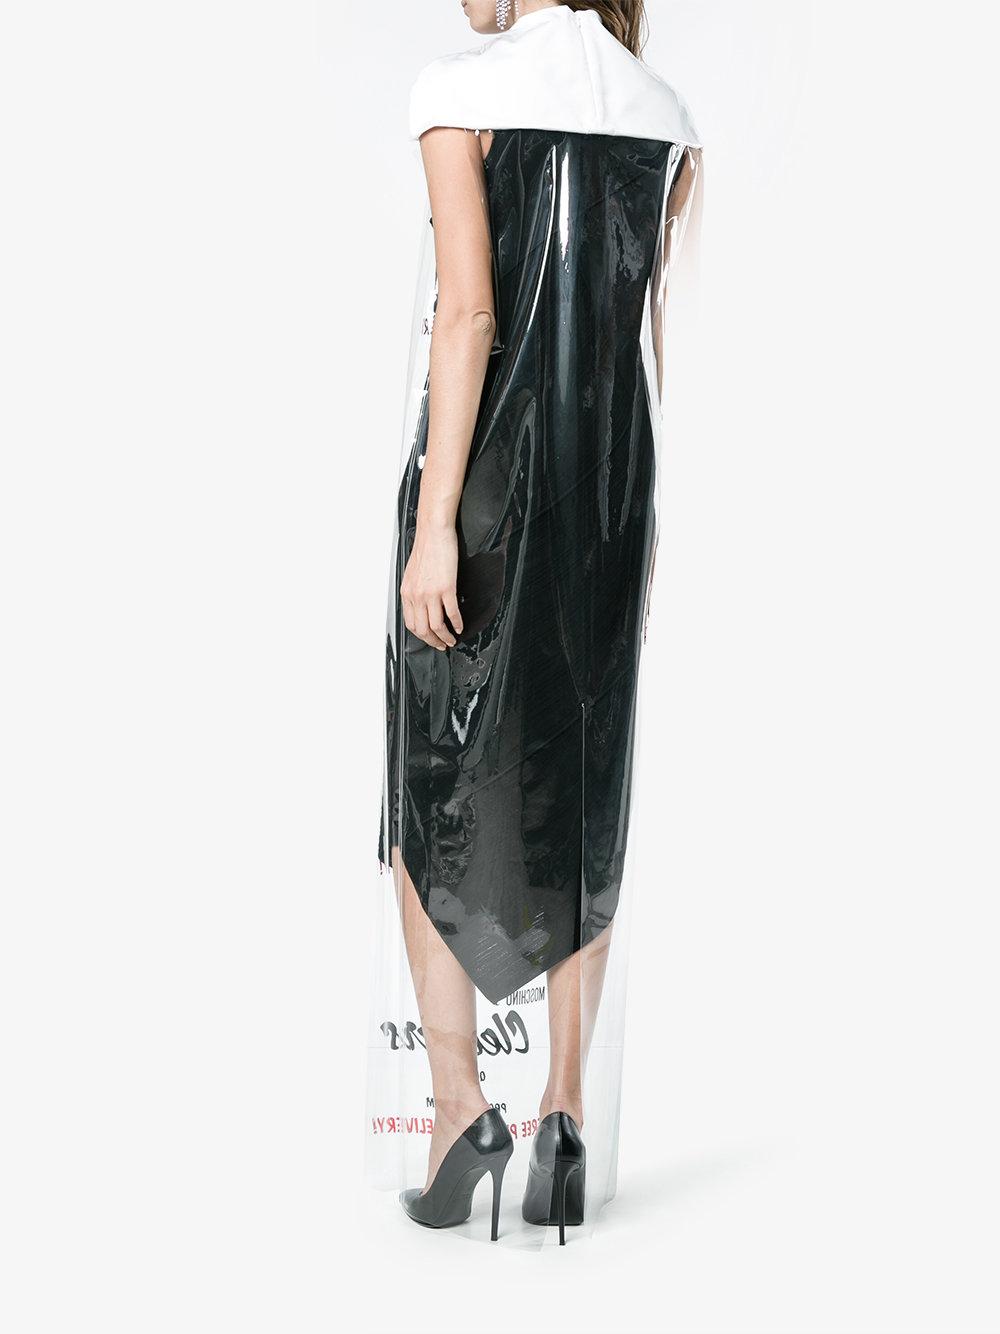 Moschino-vestido-bolsa de plastico-Brown-03